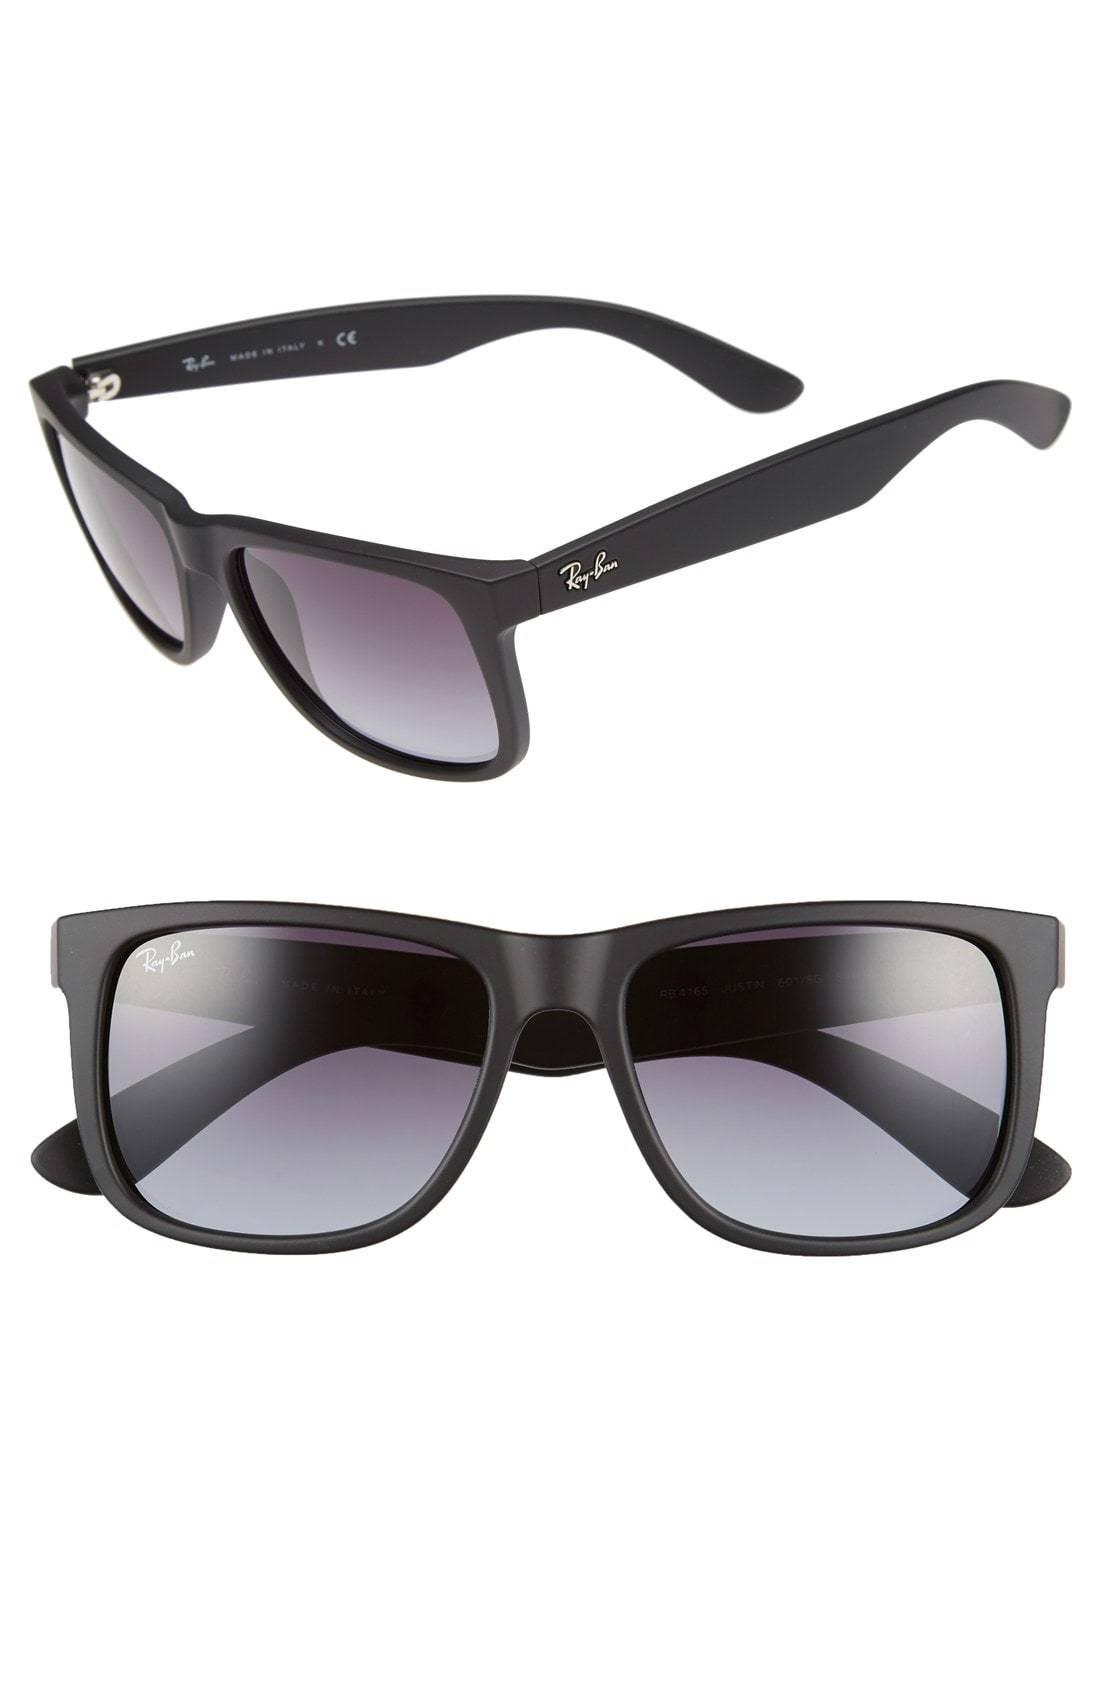 58bf1fc0c6 ... Ray-Ban Justin Classic 54mm Sunglasses